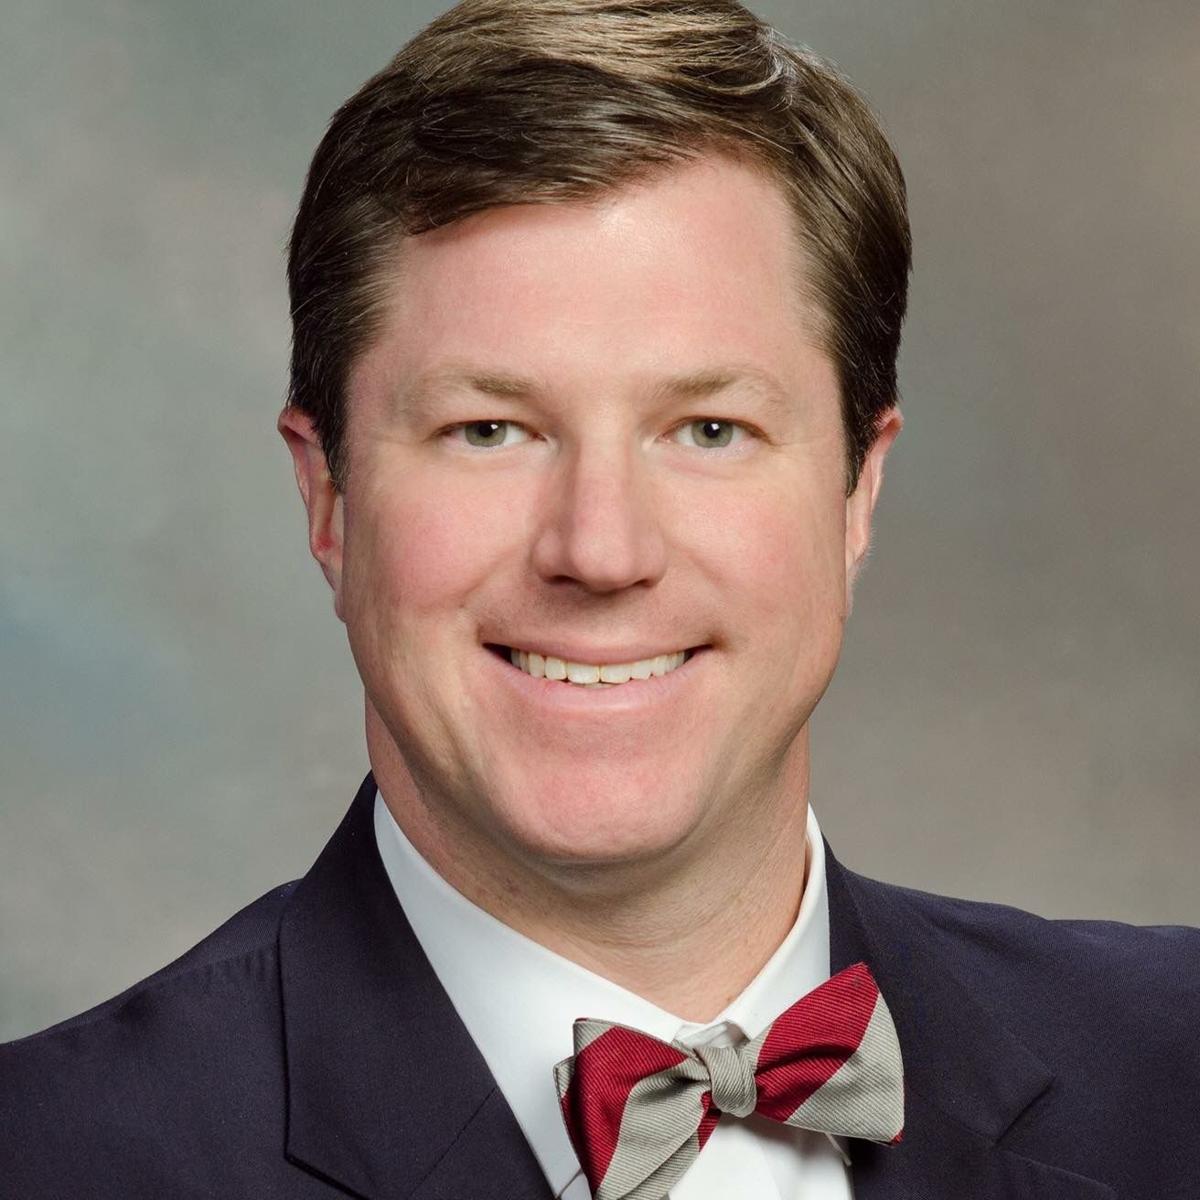 Christopher K. Peace Headshot